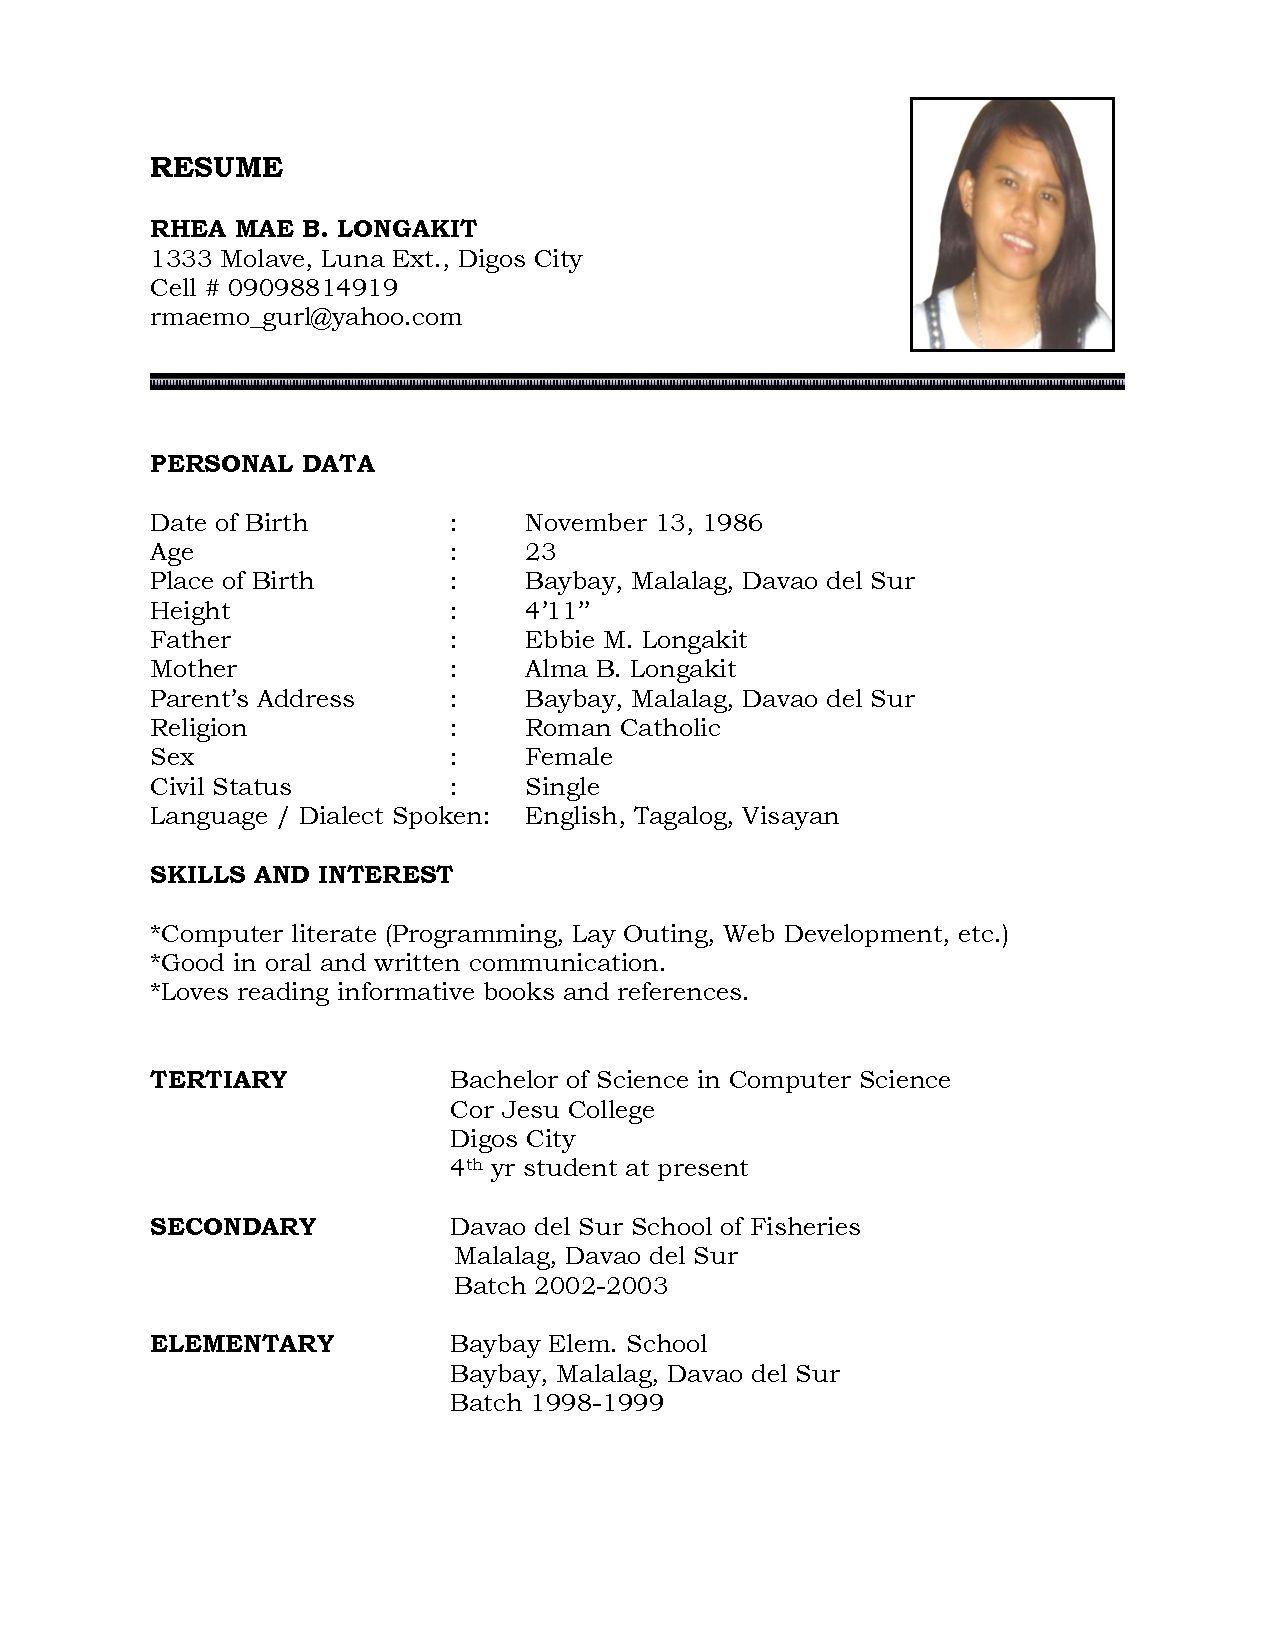 Resume Format Job 2Resume Format Job resume format